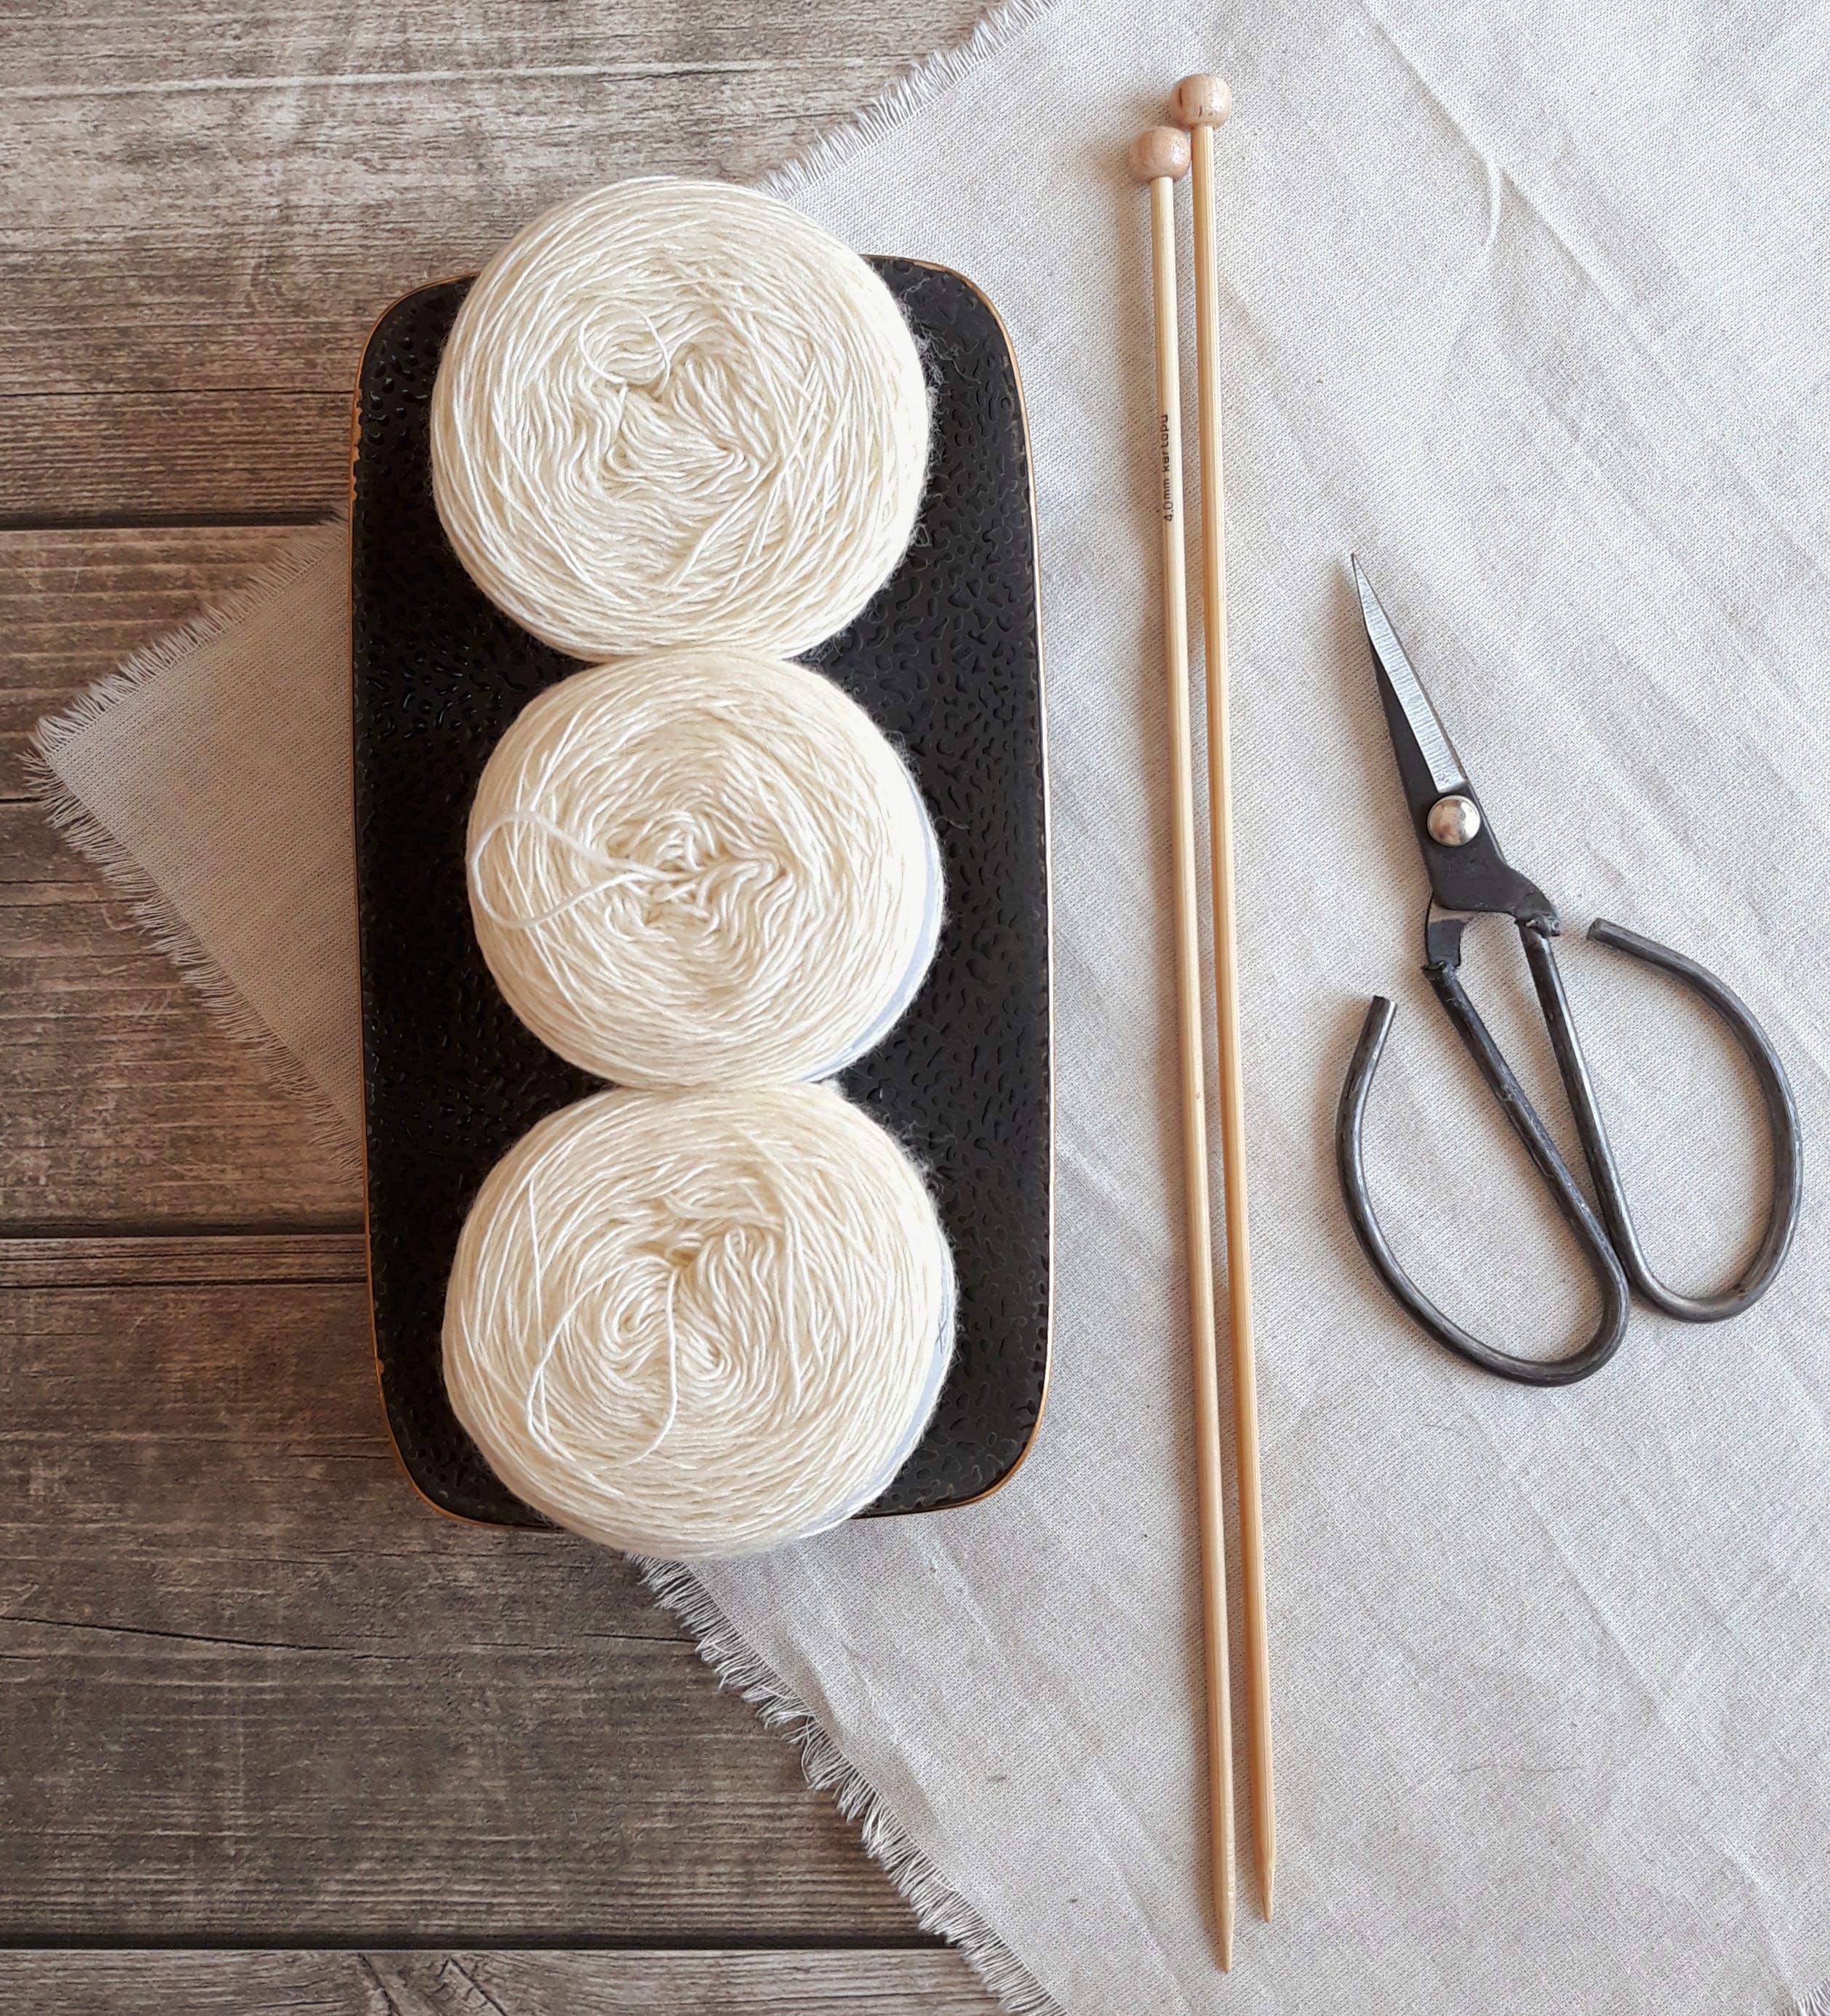 Gratis arkivbilde med alpakka, garn, strikking, ull